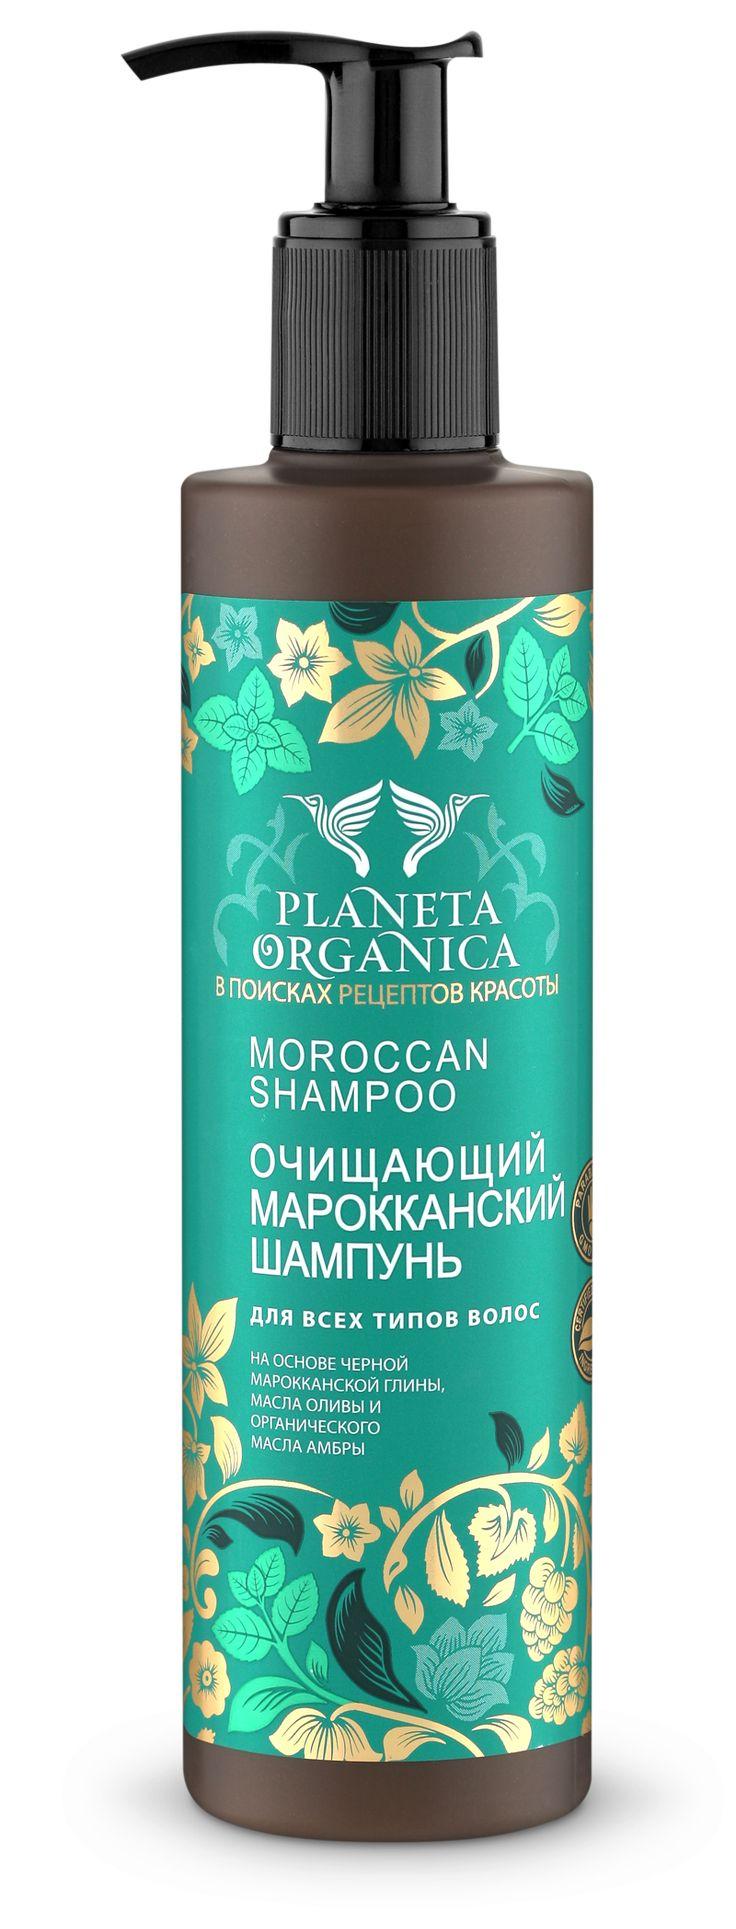 Очищающий марокканский шампунь | Planeta Organica